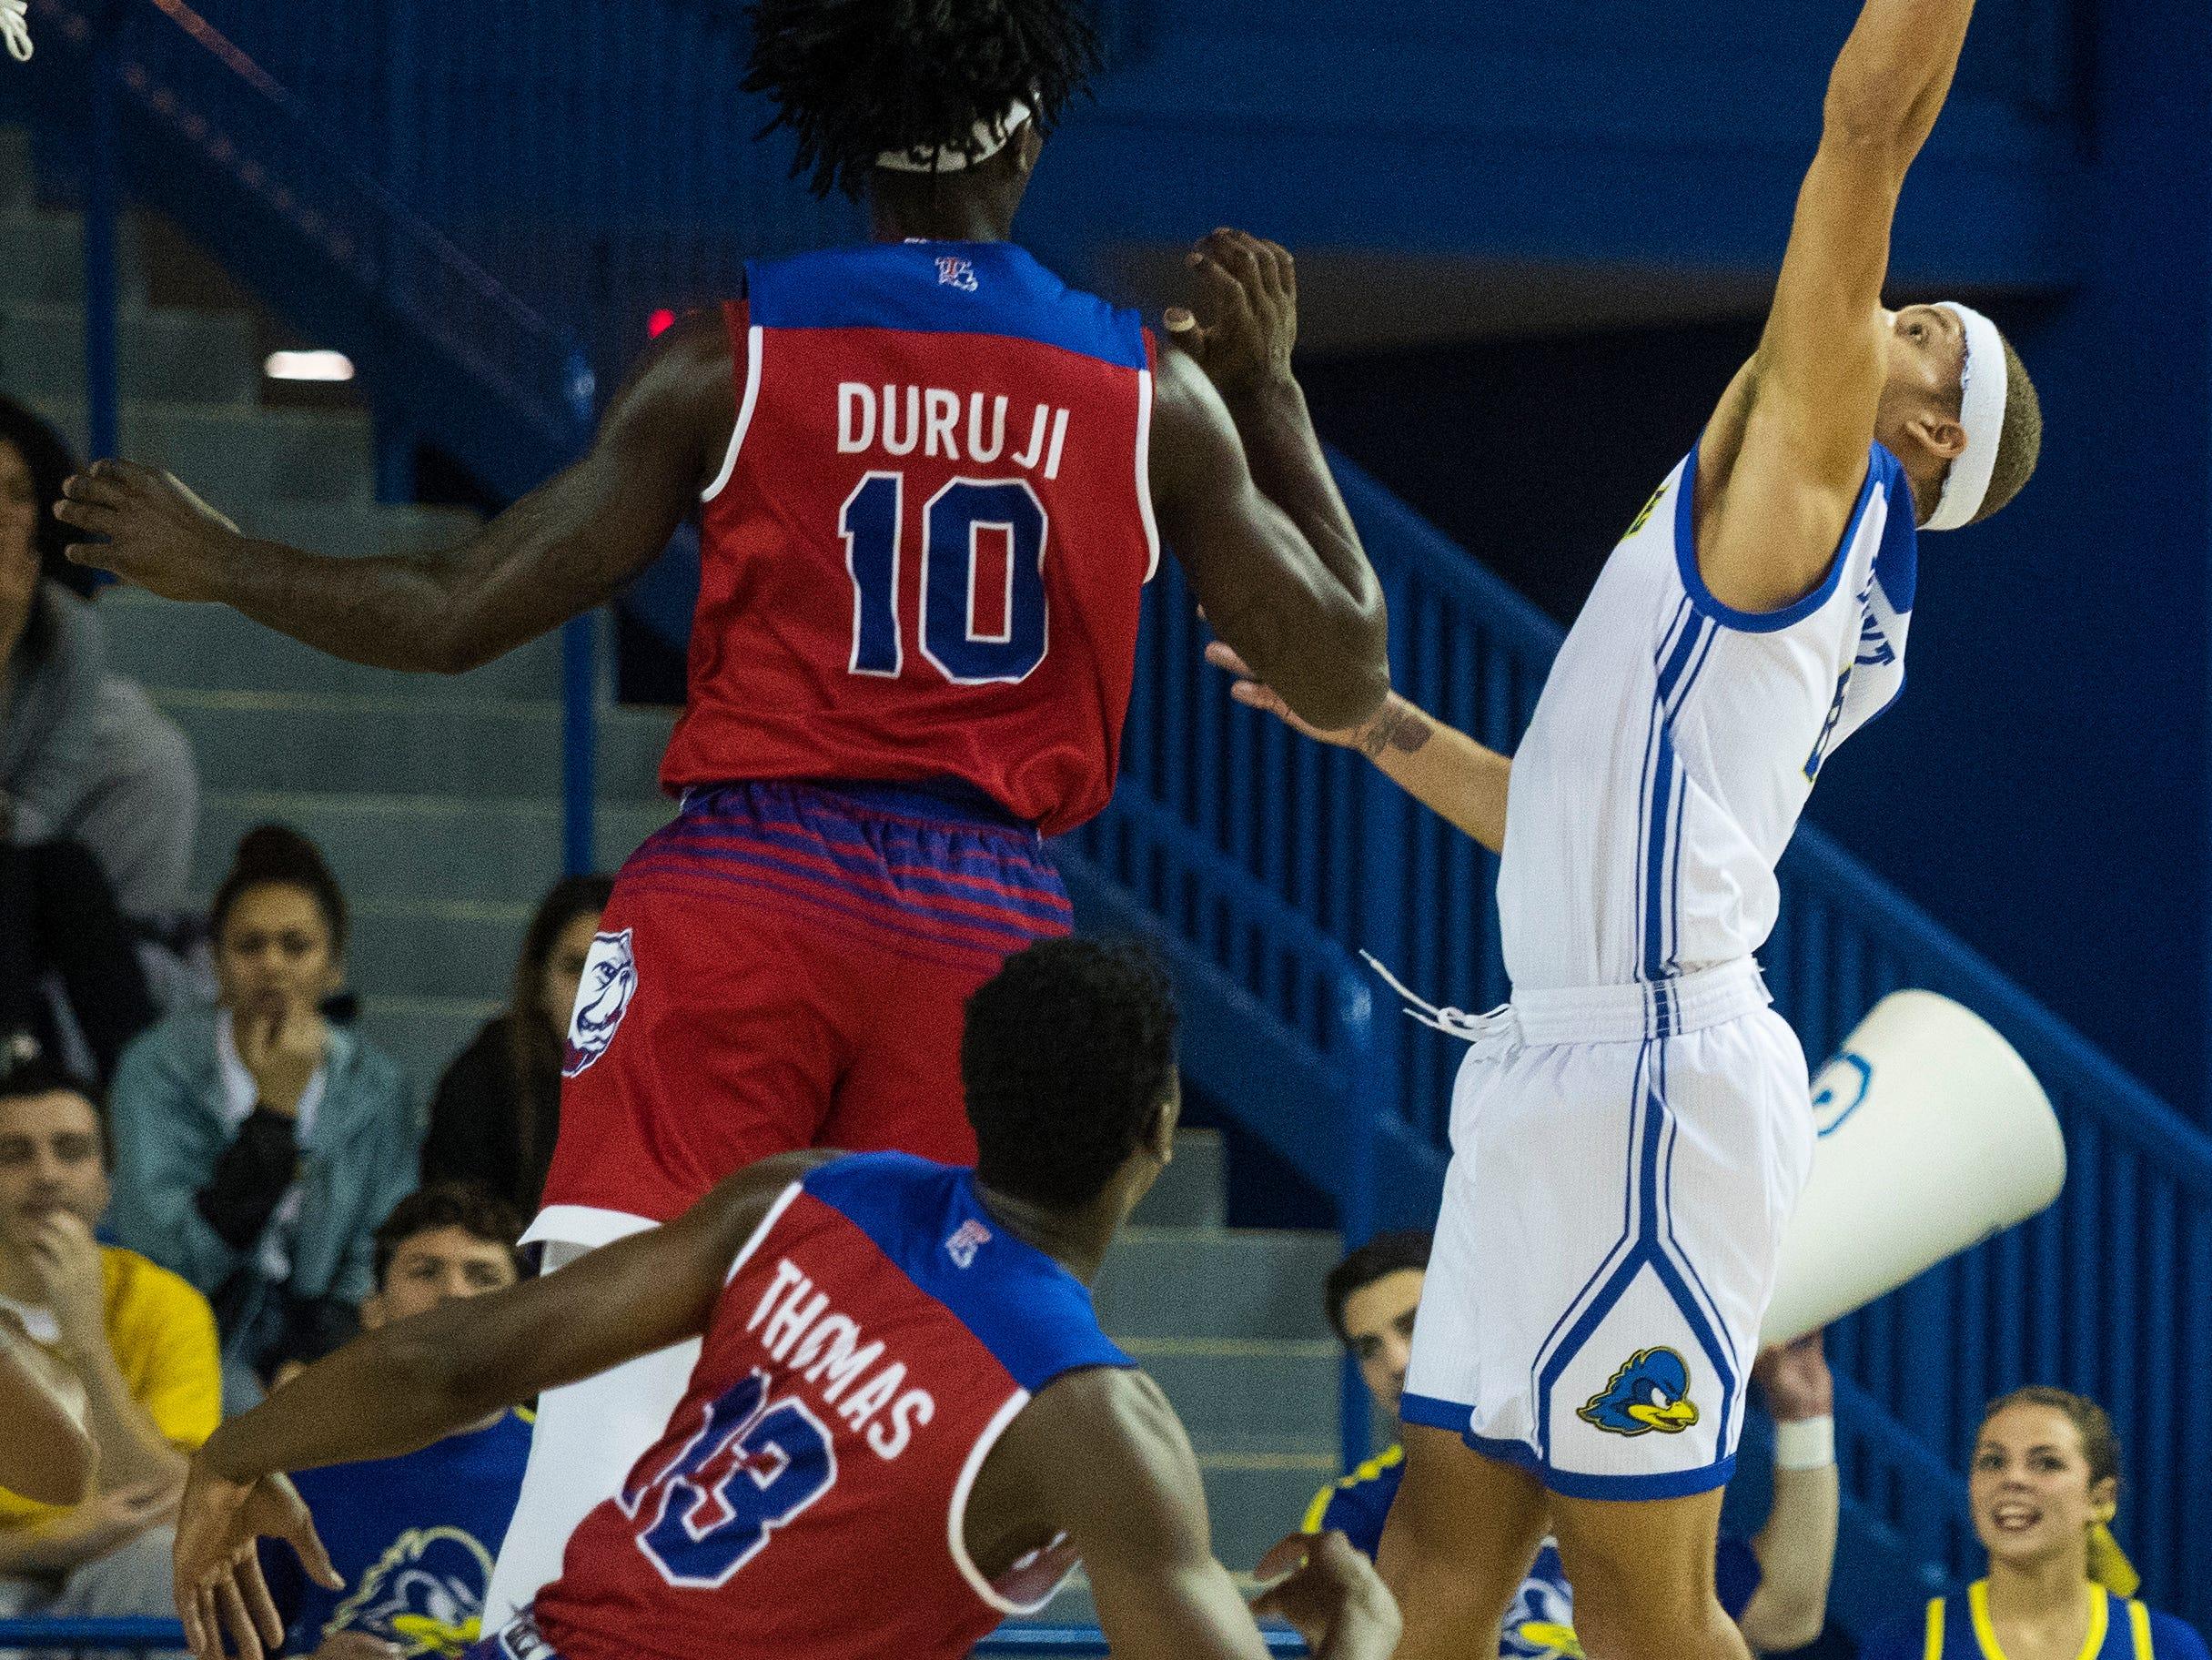 Delaware's Darian Bryant (4) reaches up for a rebound Monday at the Bob Carpenter Center. Delaware defeated Louisiana Tech 75-71.